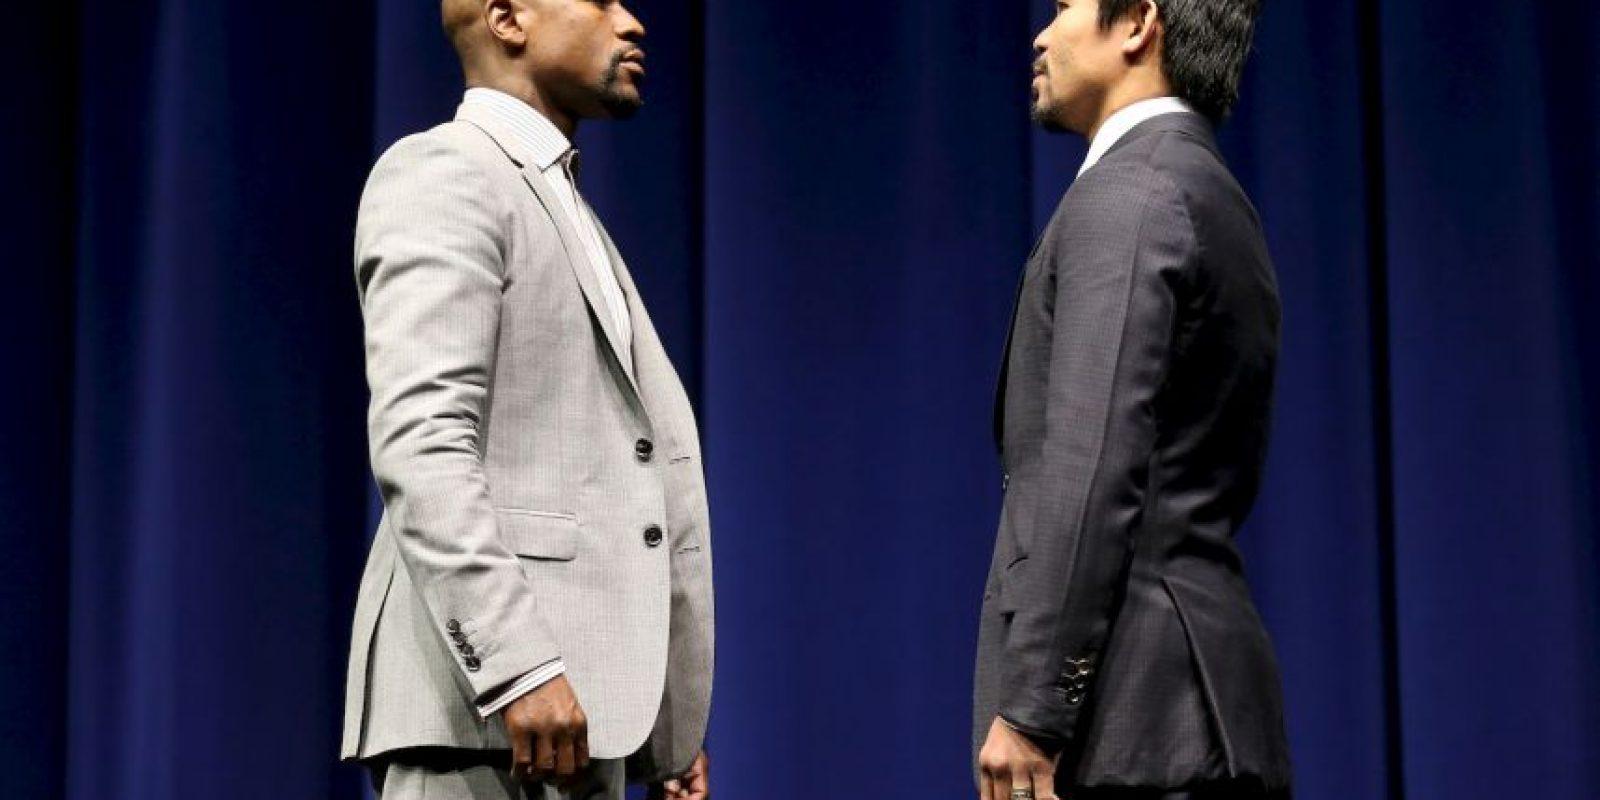 Así luce Floyd a sus 38 años Foto:Getty Images